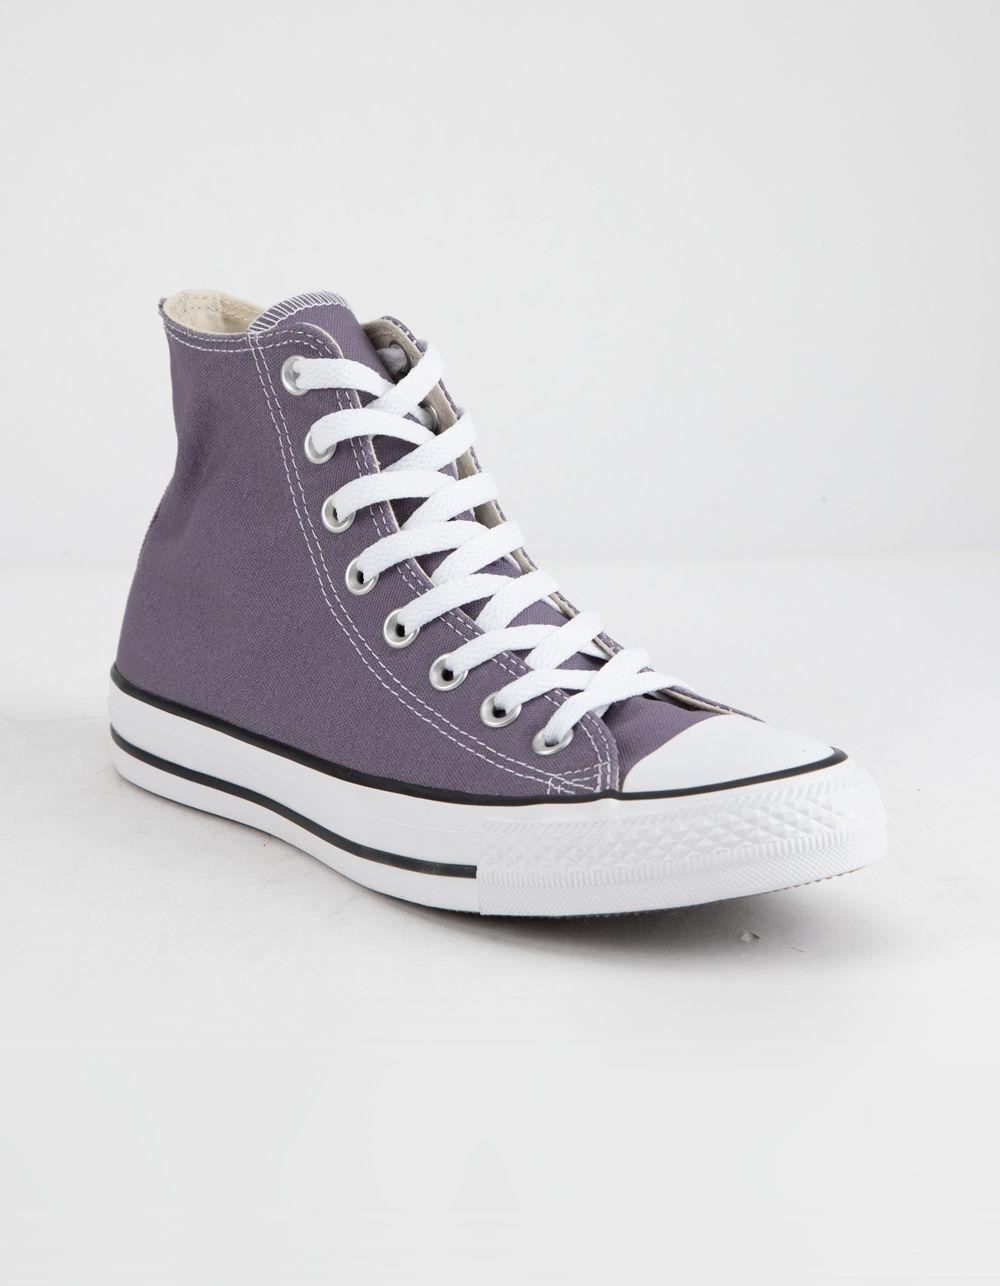 478e3e40523 Lyst - Converse Chuck Taylor All Star Moody Purple High Top Womens ...